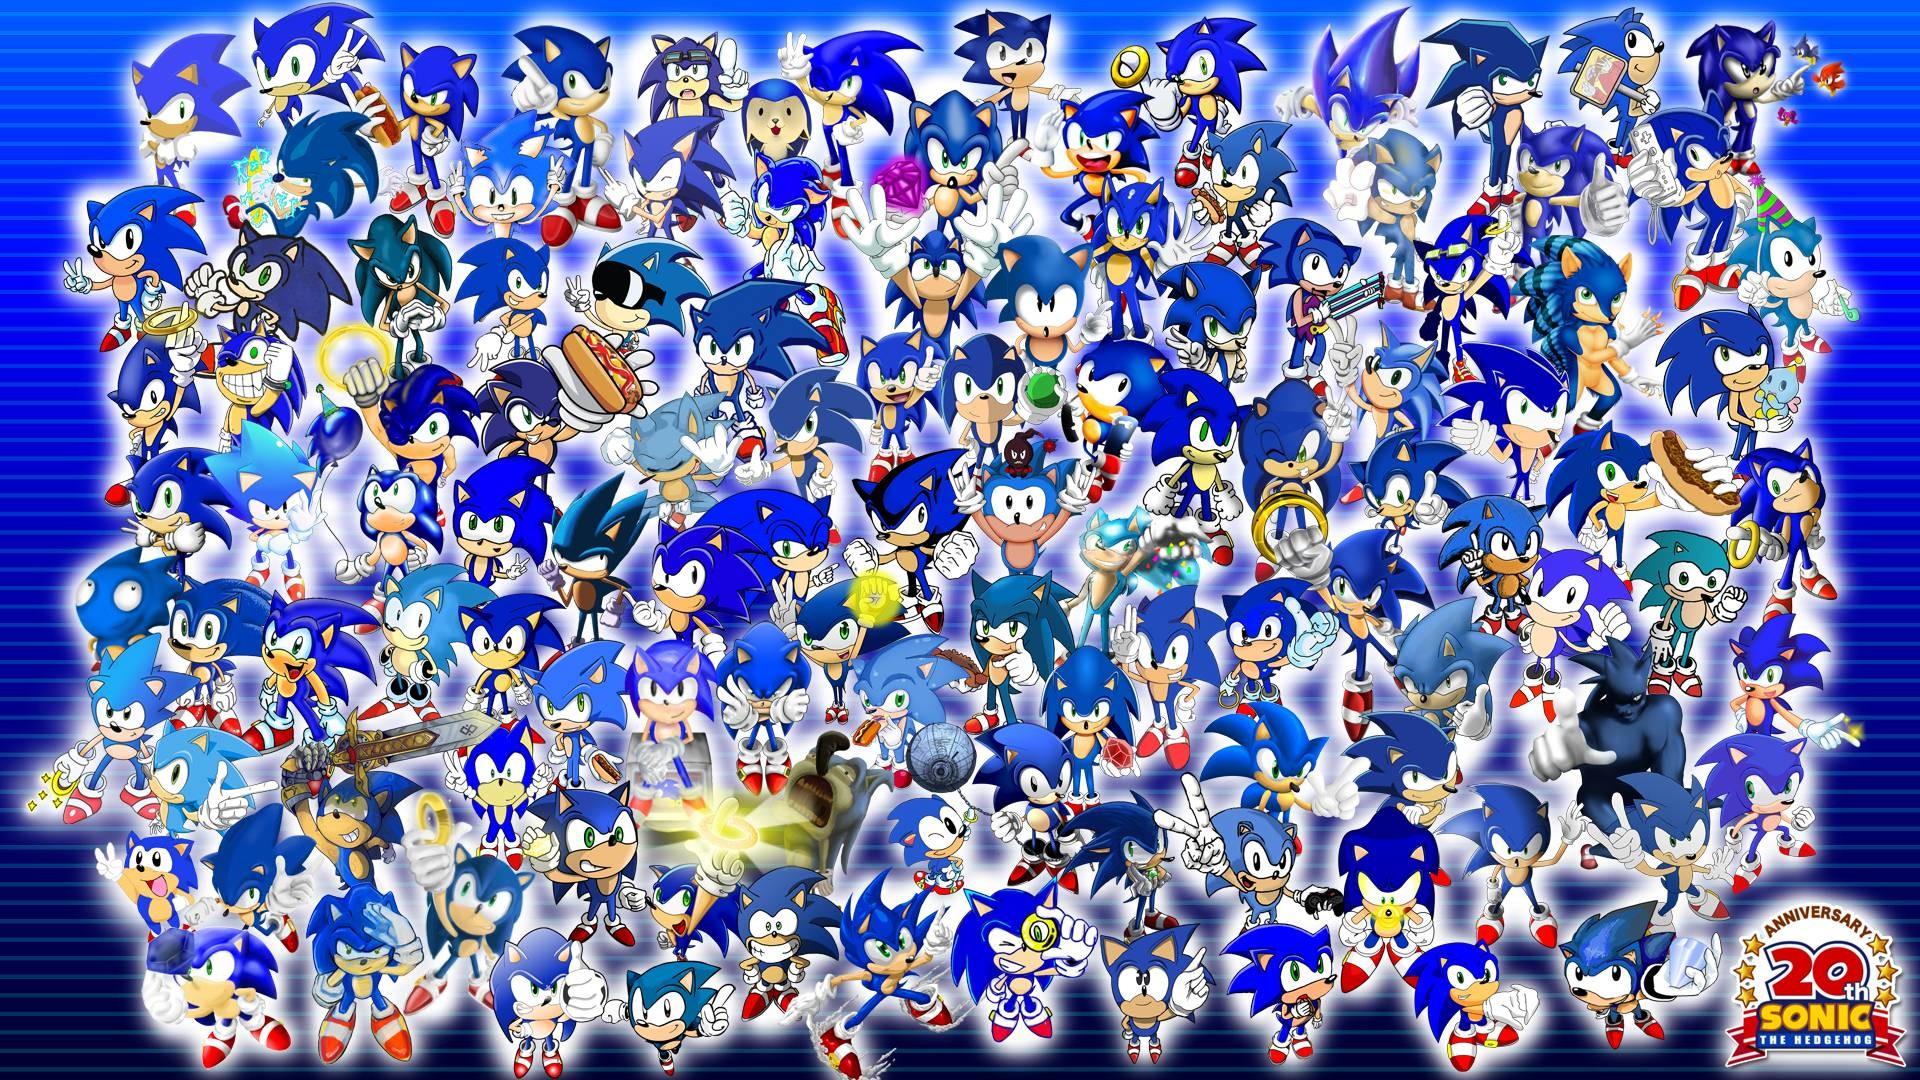 Project 20 Sonic Wallpaper – Sonic the Hedgehog Wallpaper .